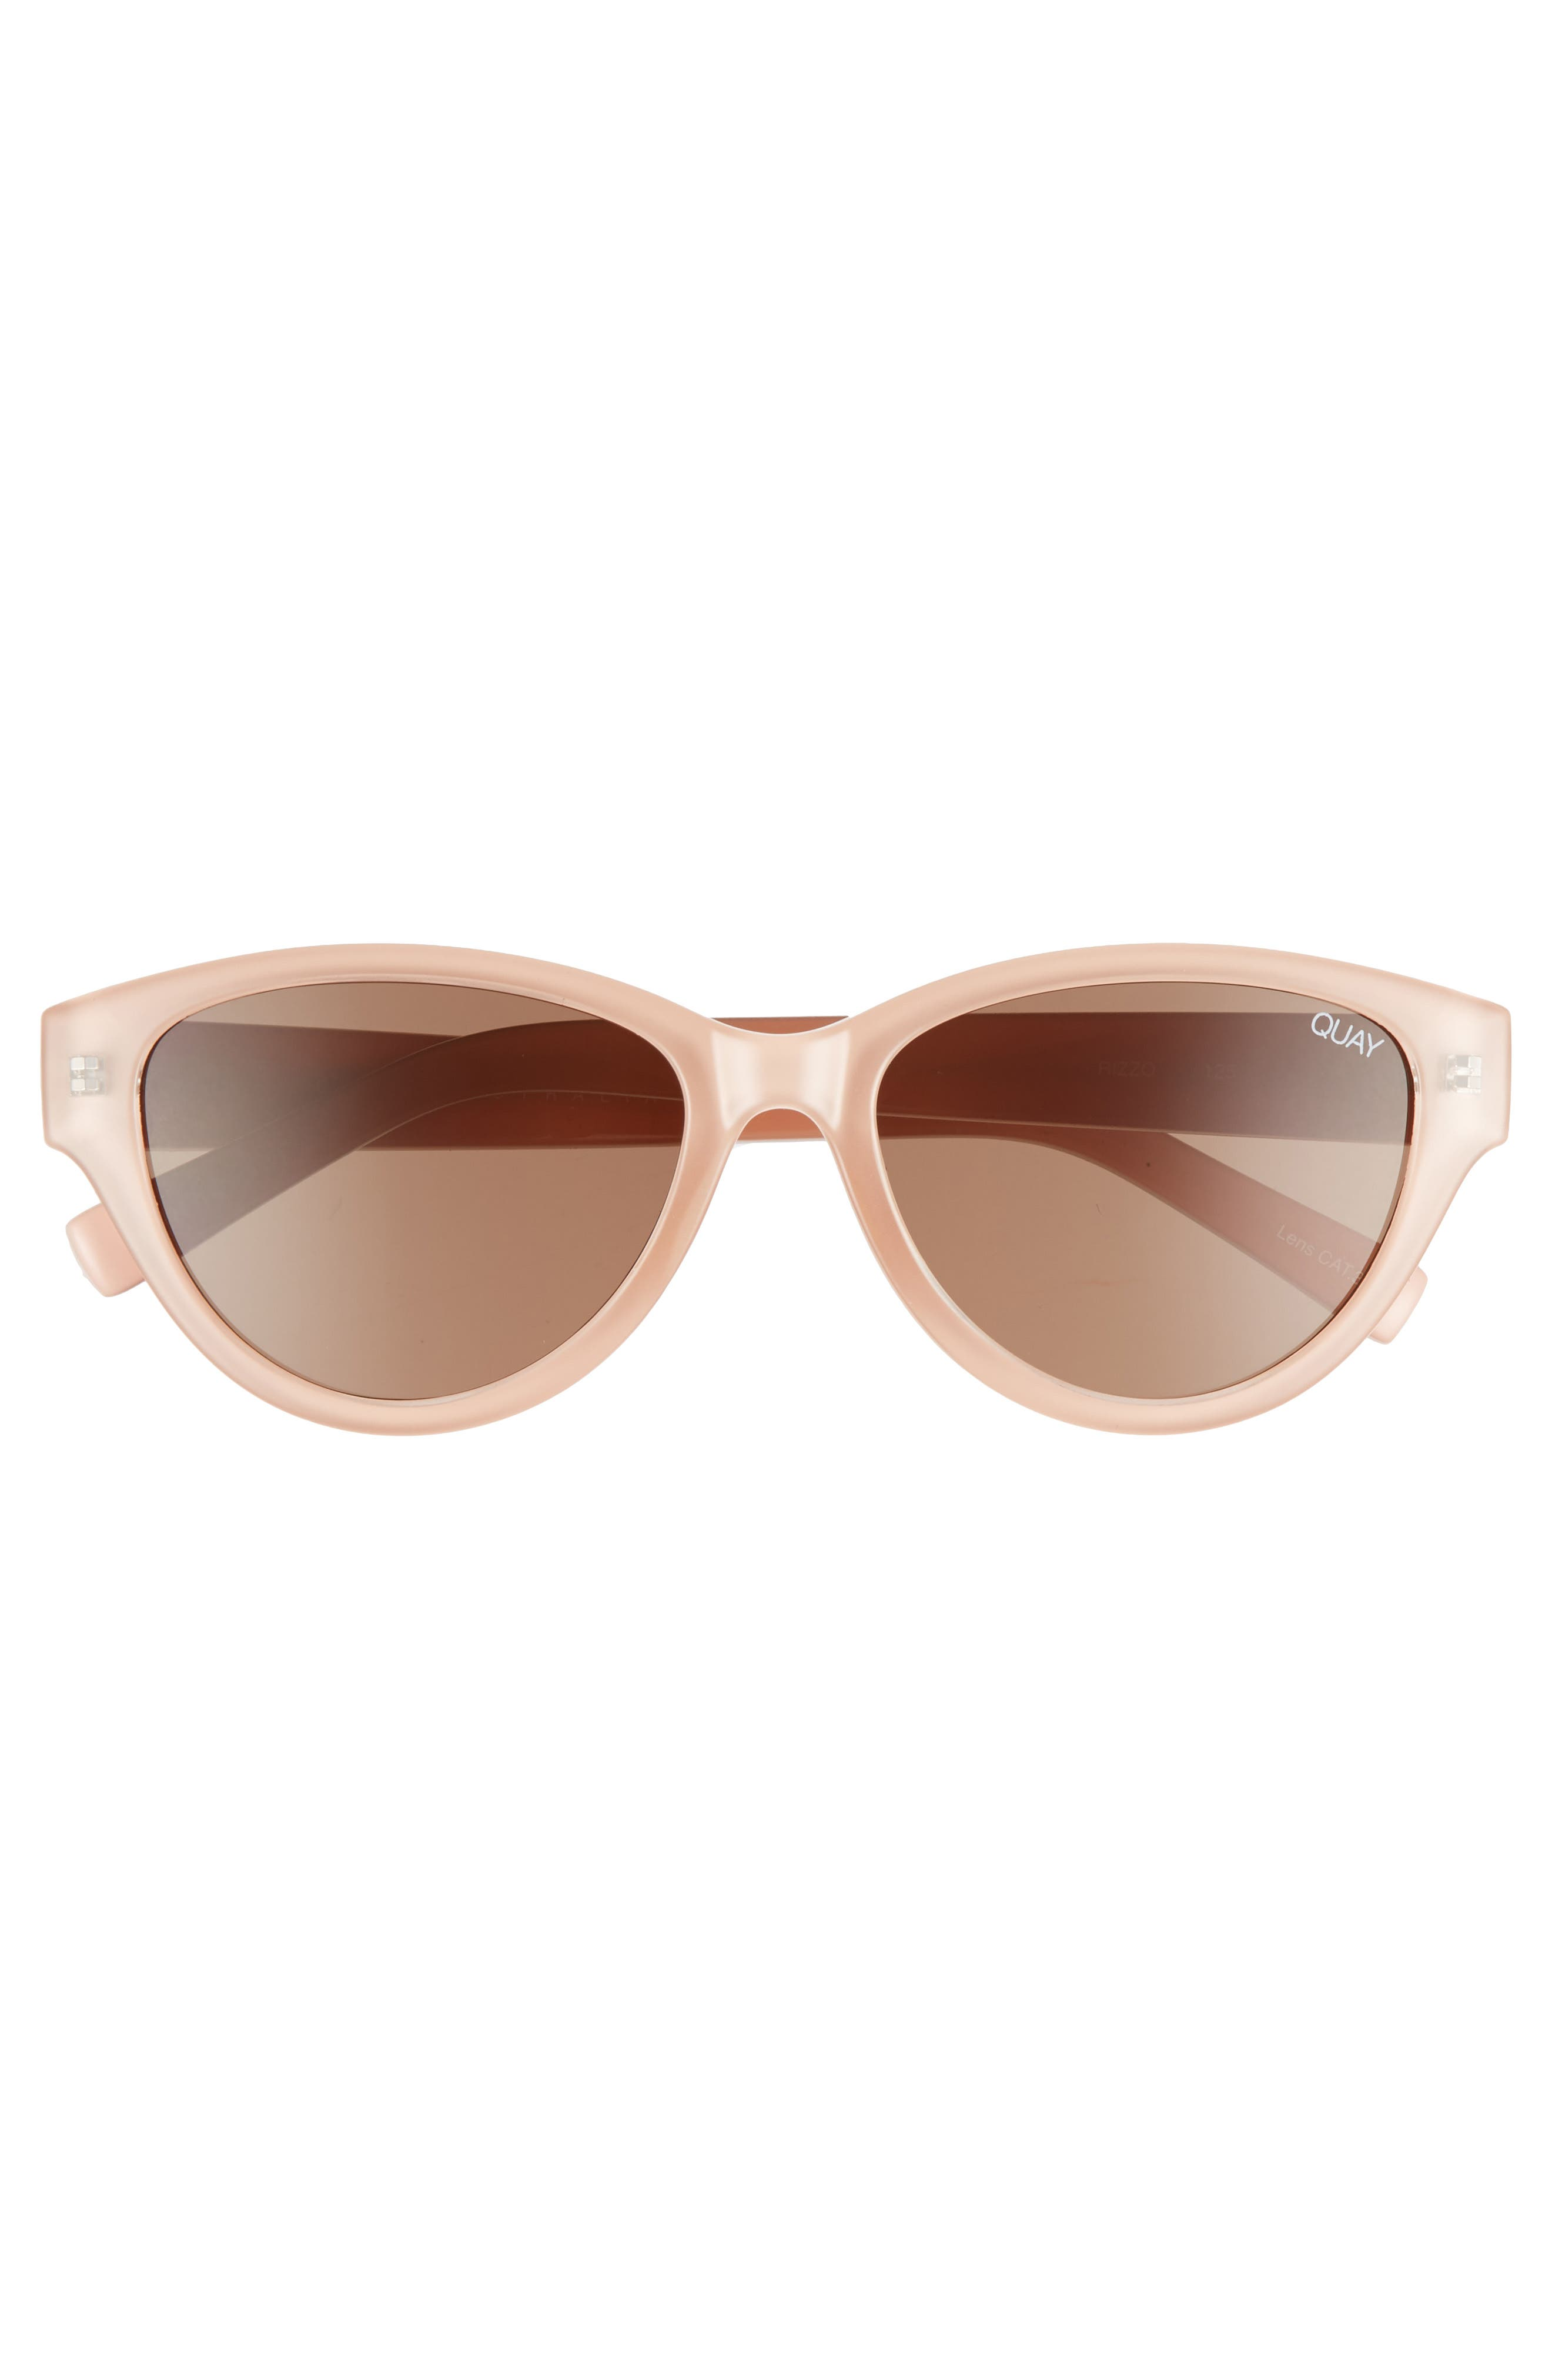 Rizzo 55mm Cat Eye Sunglasses,                             Alternate thumbnail 3, color,                             CREAM/ BROWN